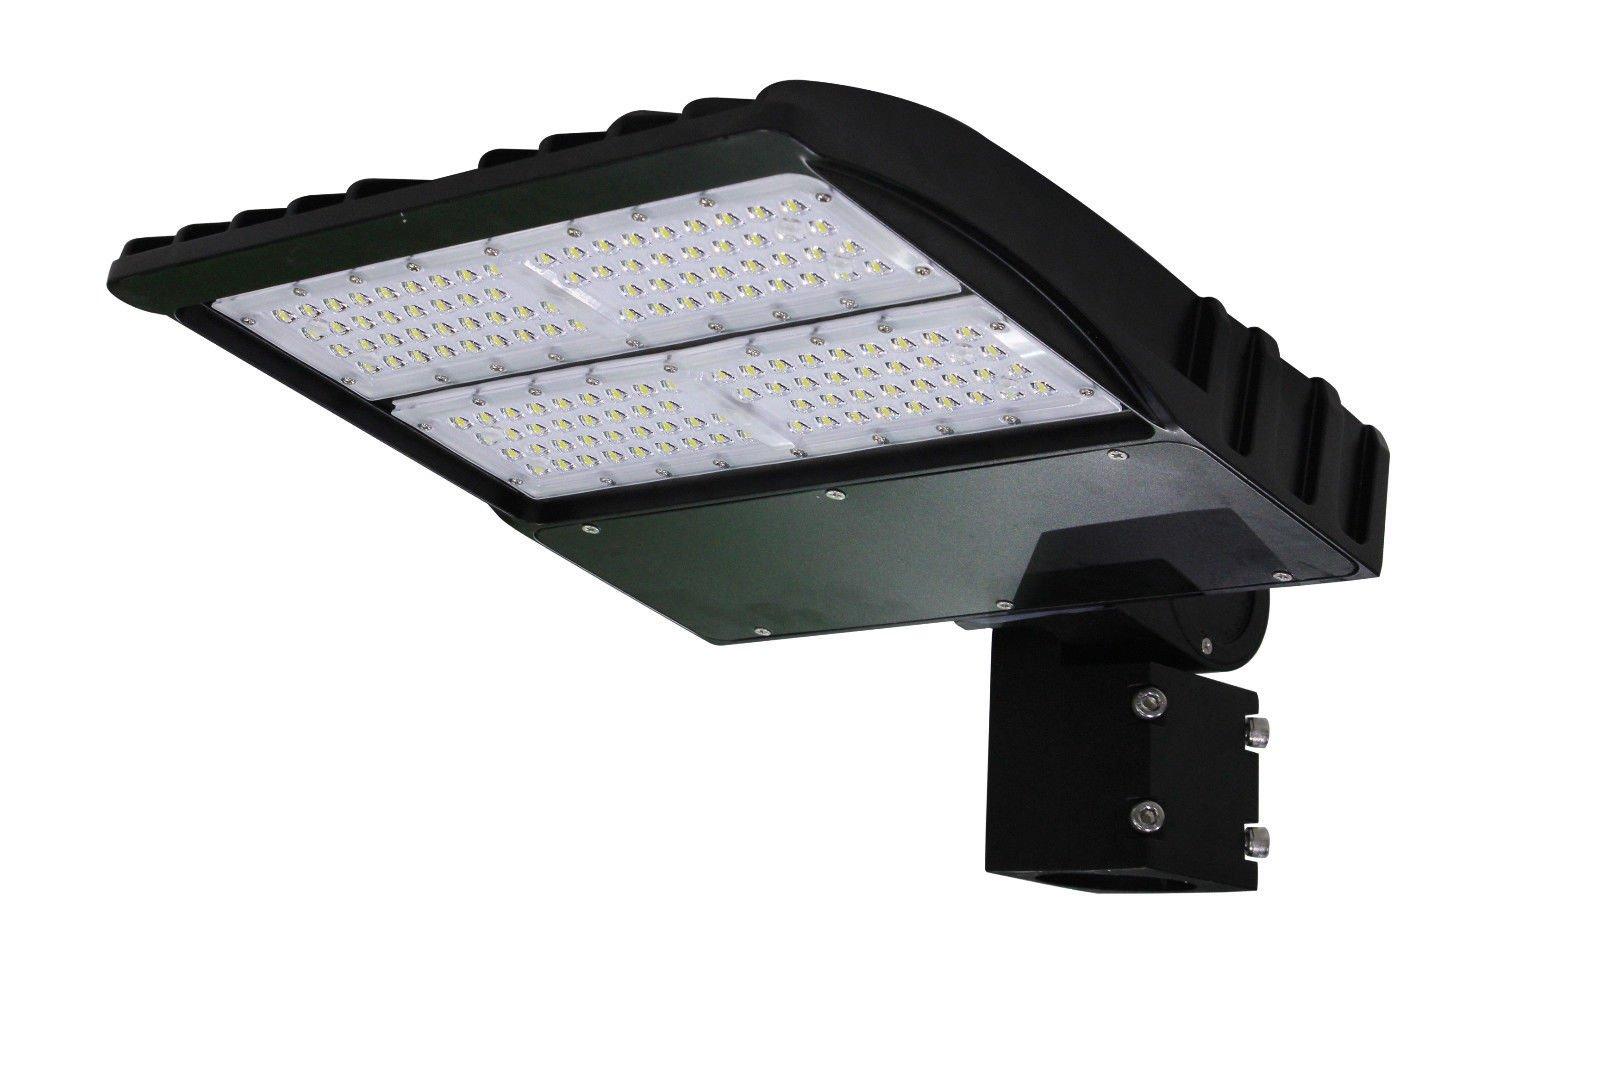 90w LED Parking Lot shoebox Light Fixture UL DLC approved - 5 years warranty Slip Fitter Adjustable Mount(AM)